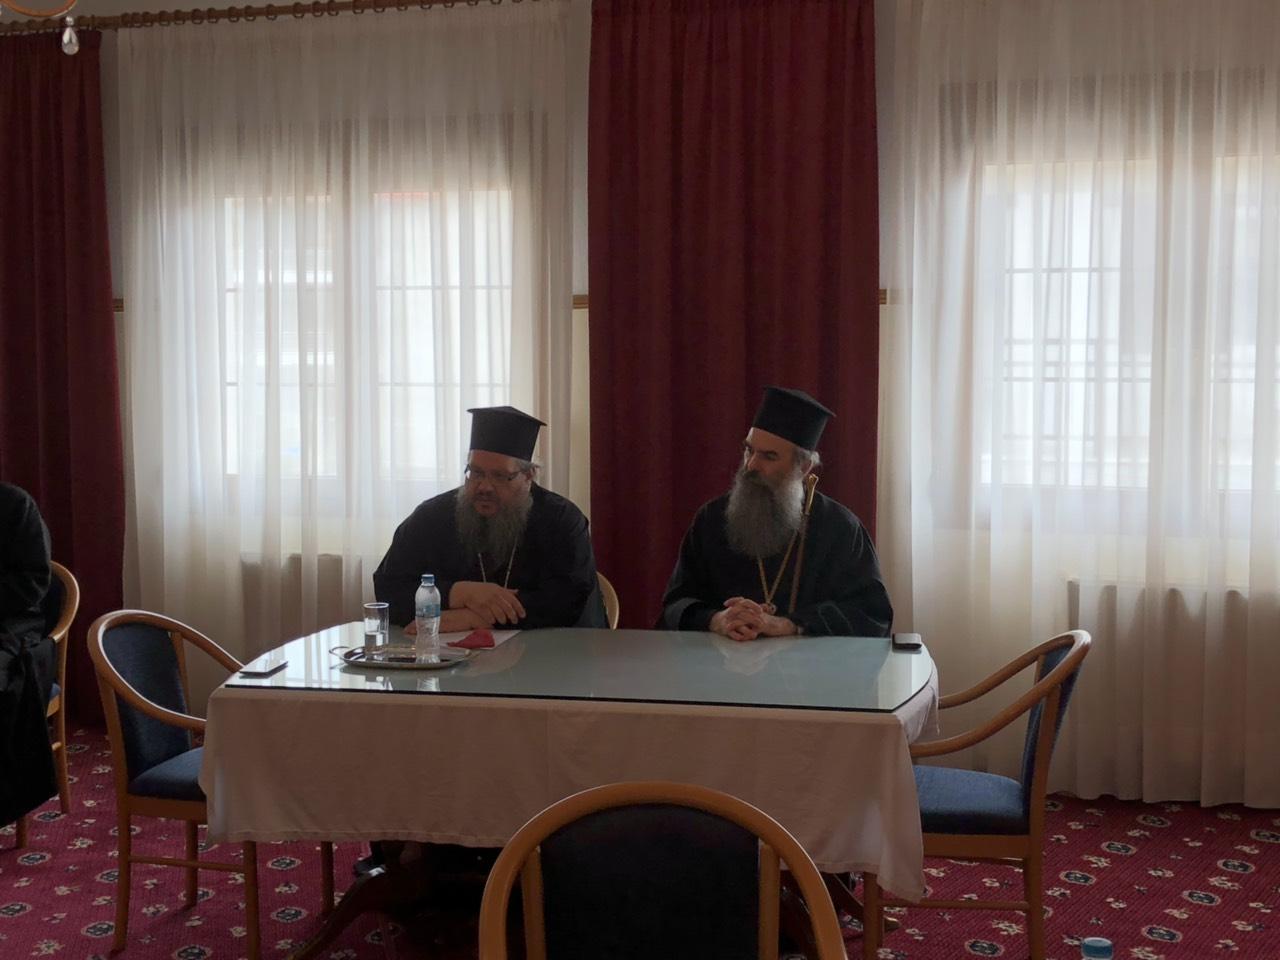 seminario elassona 1 - Ο Σεβασμιώτατος Ομιλητής Σε Επιμορφωτικό Σεμιναριο Στην Ιερά Μητρόπολη Ελασσώνος